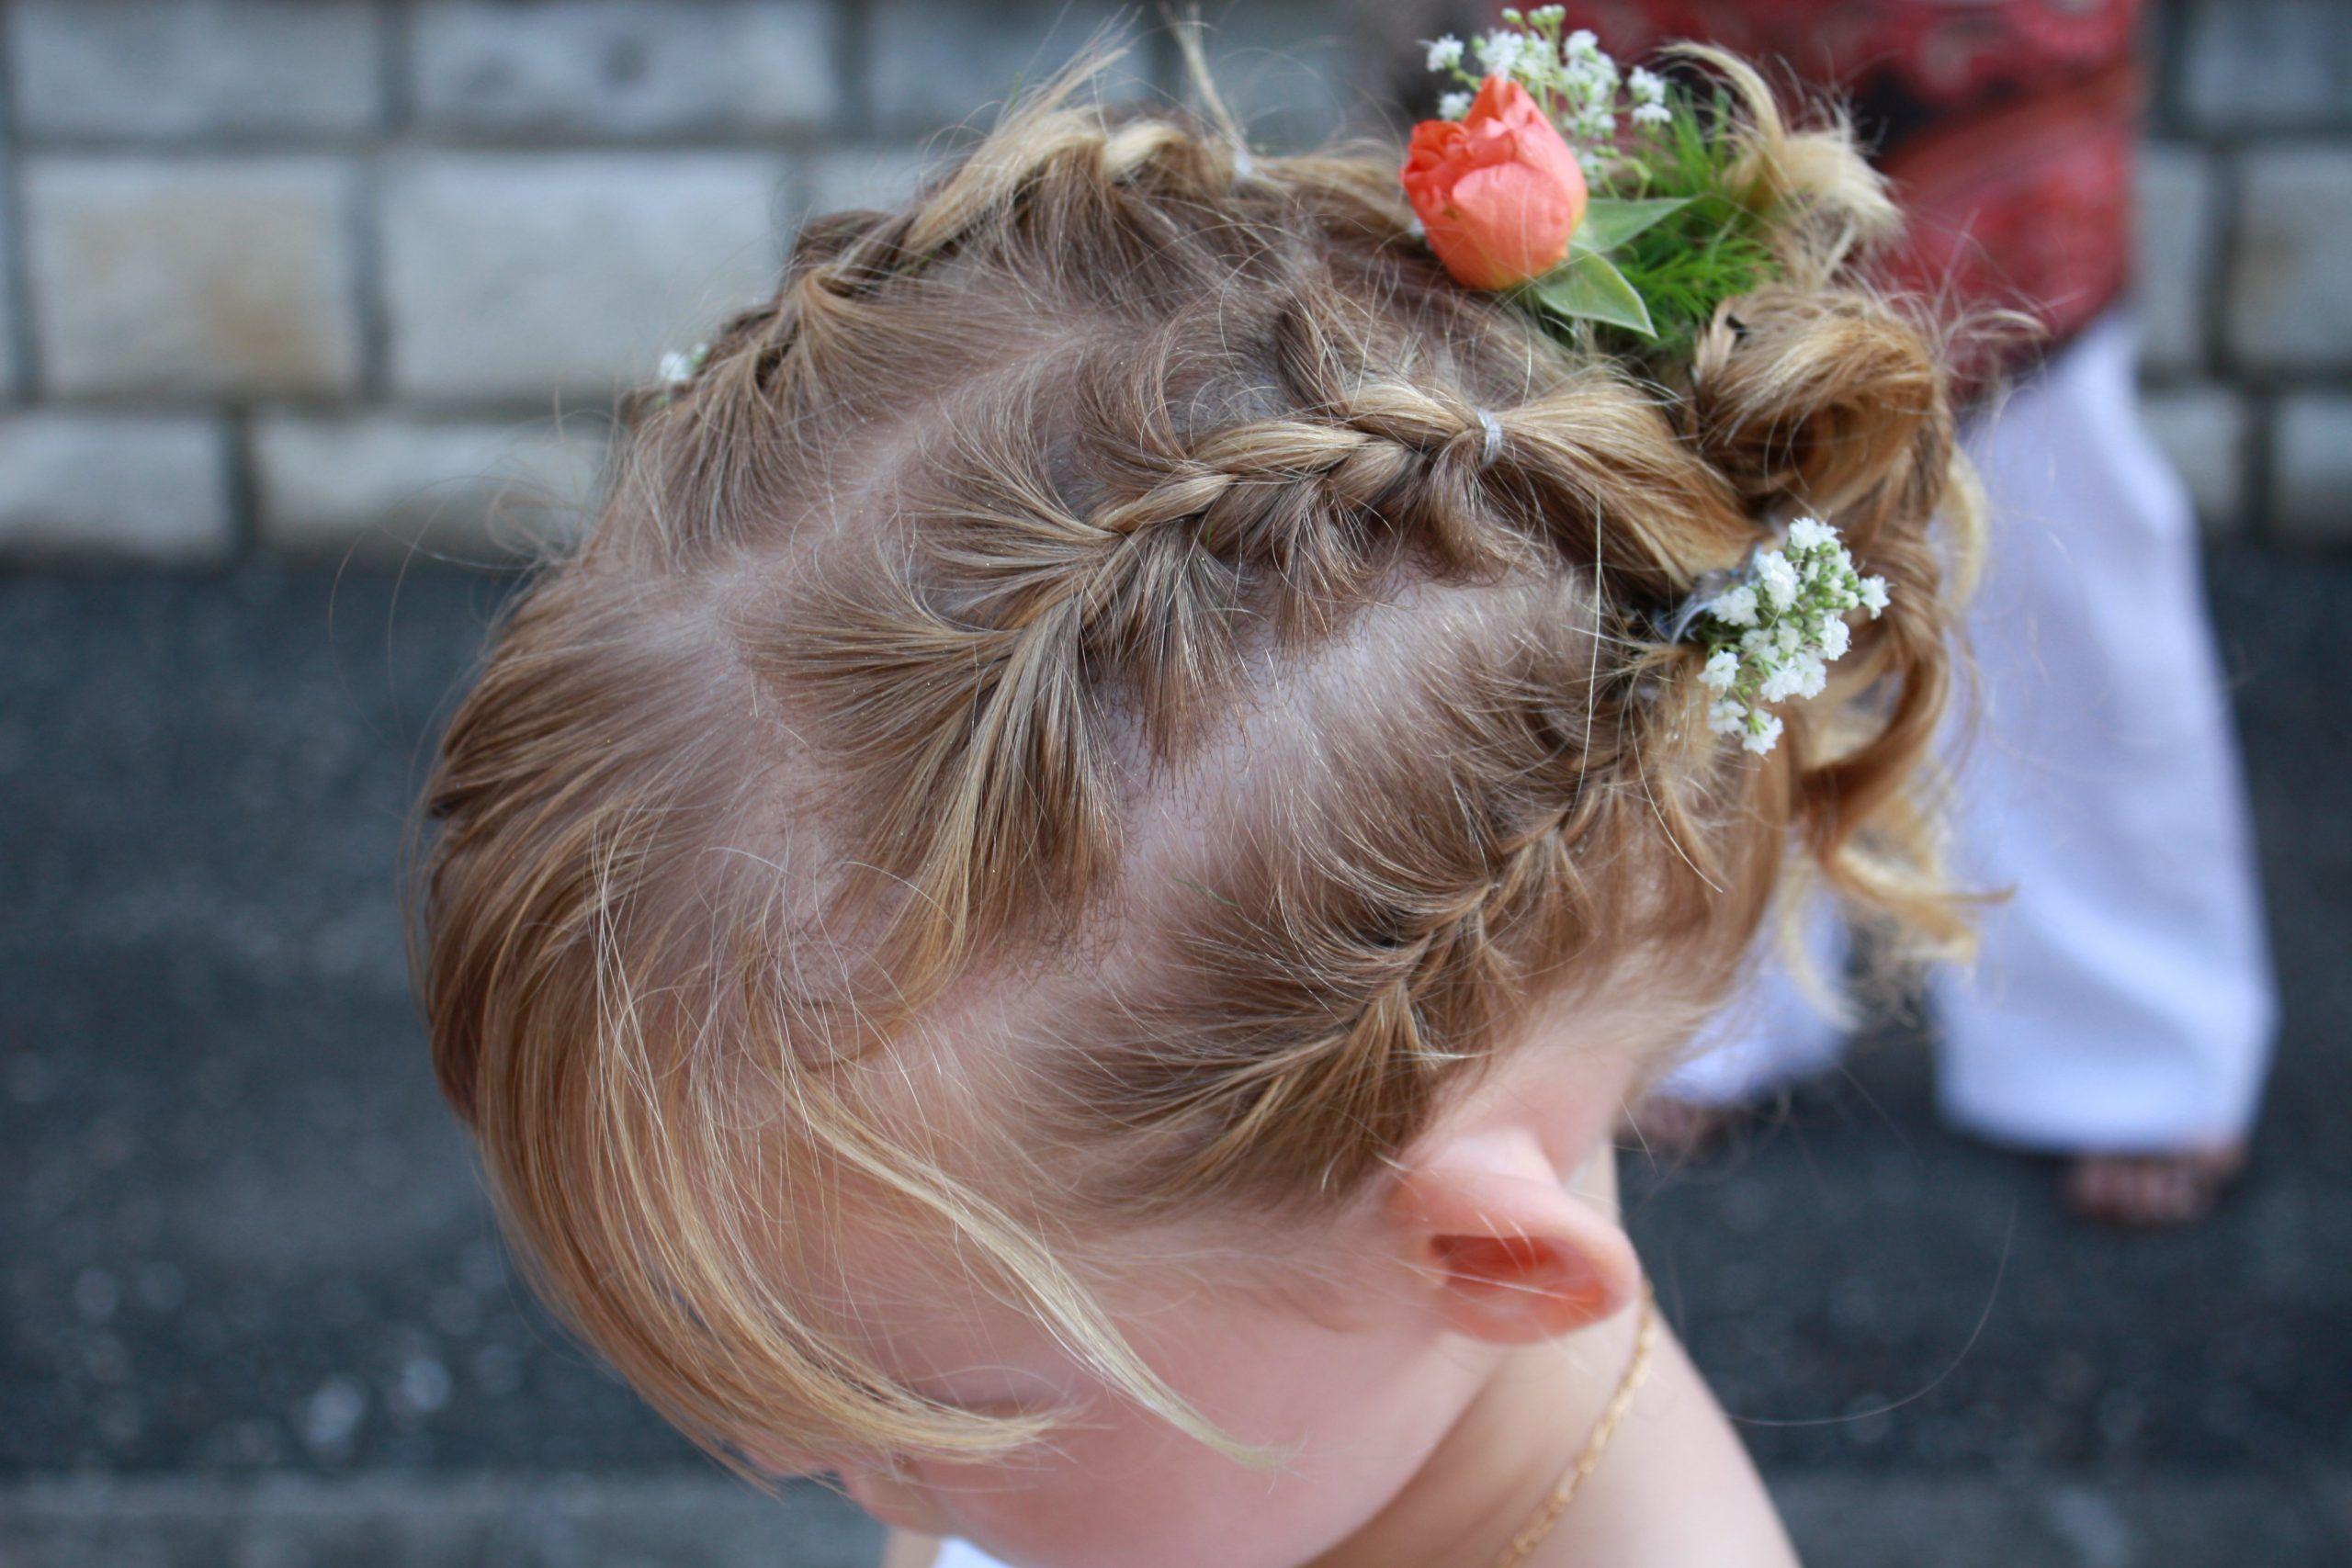 Inspiration Cheveux : chignon fille - #1899 | Inspiration ...